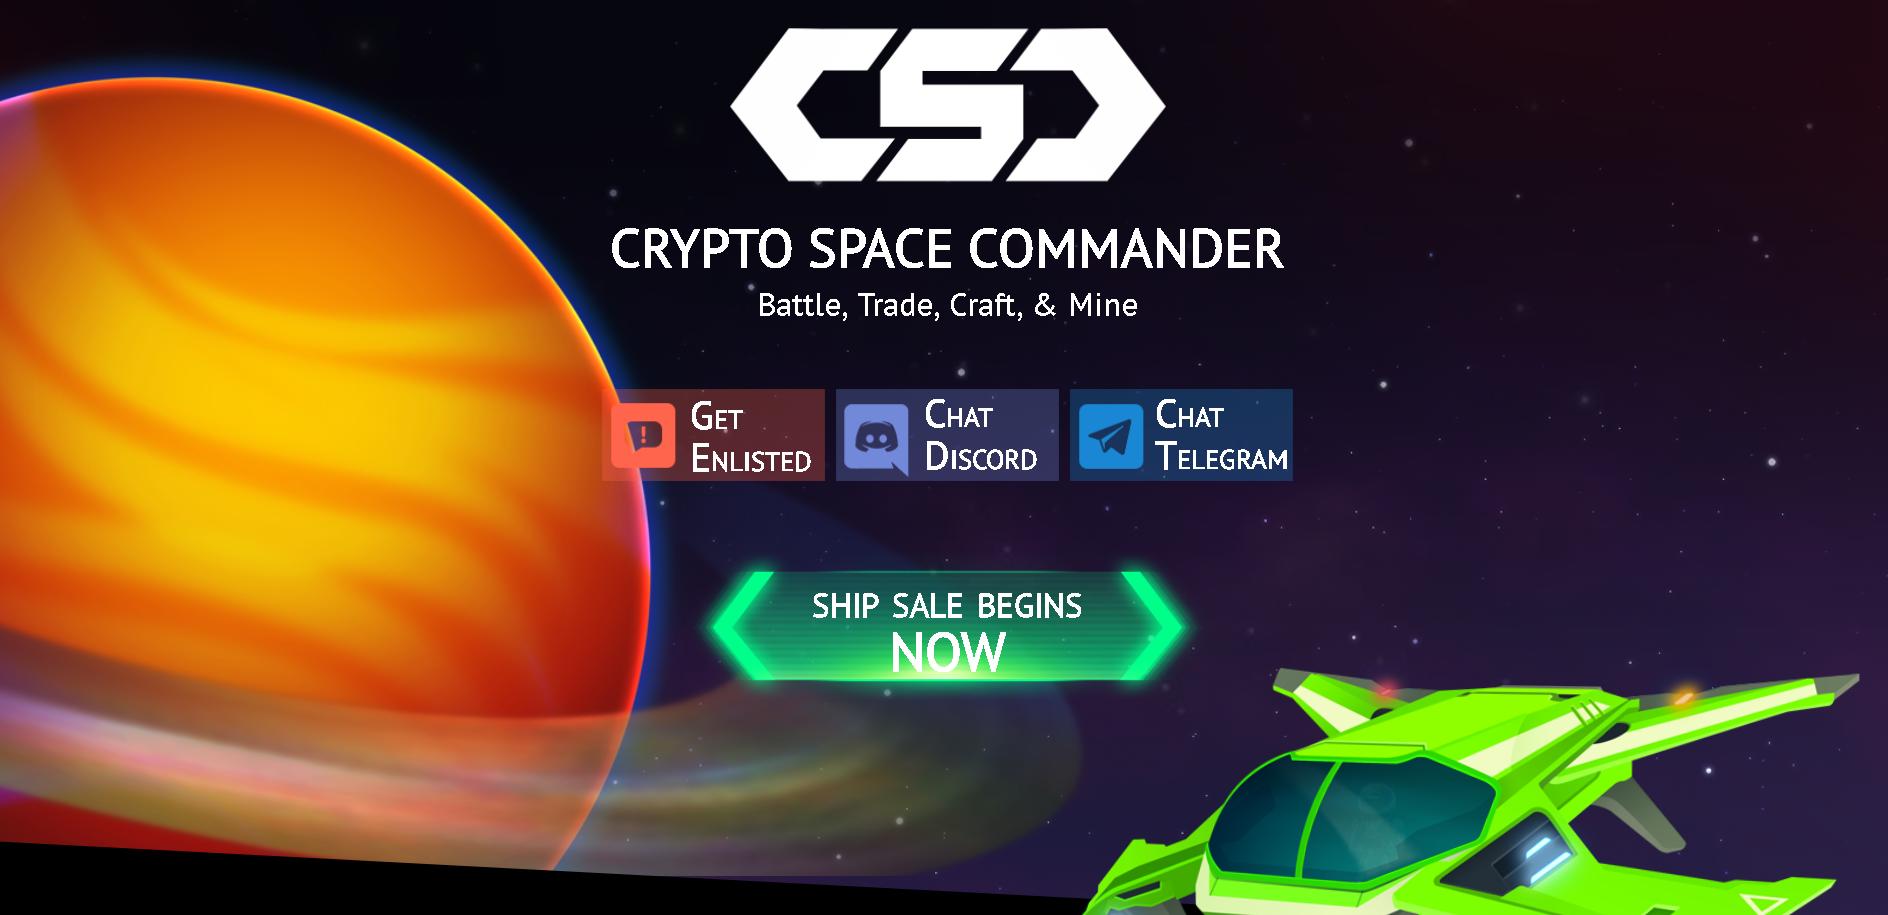 【Dapps】クリプトスペースコマンダー(CSC)の登録方法、始め方を解説!